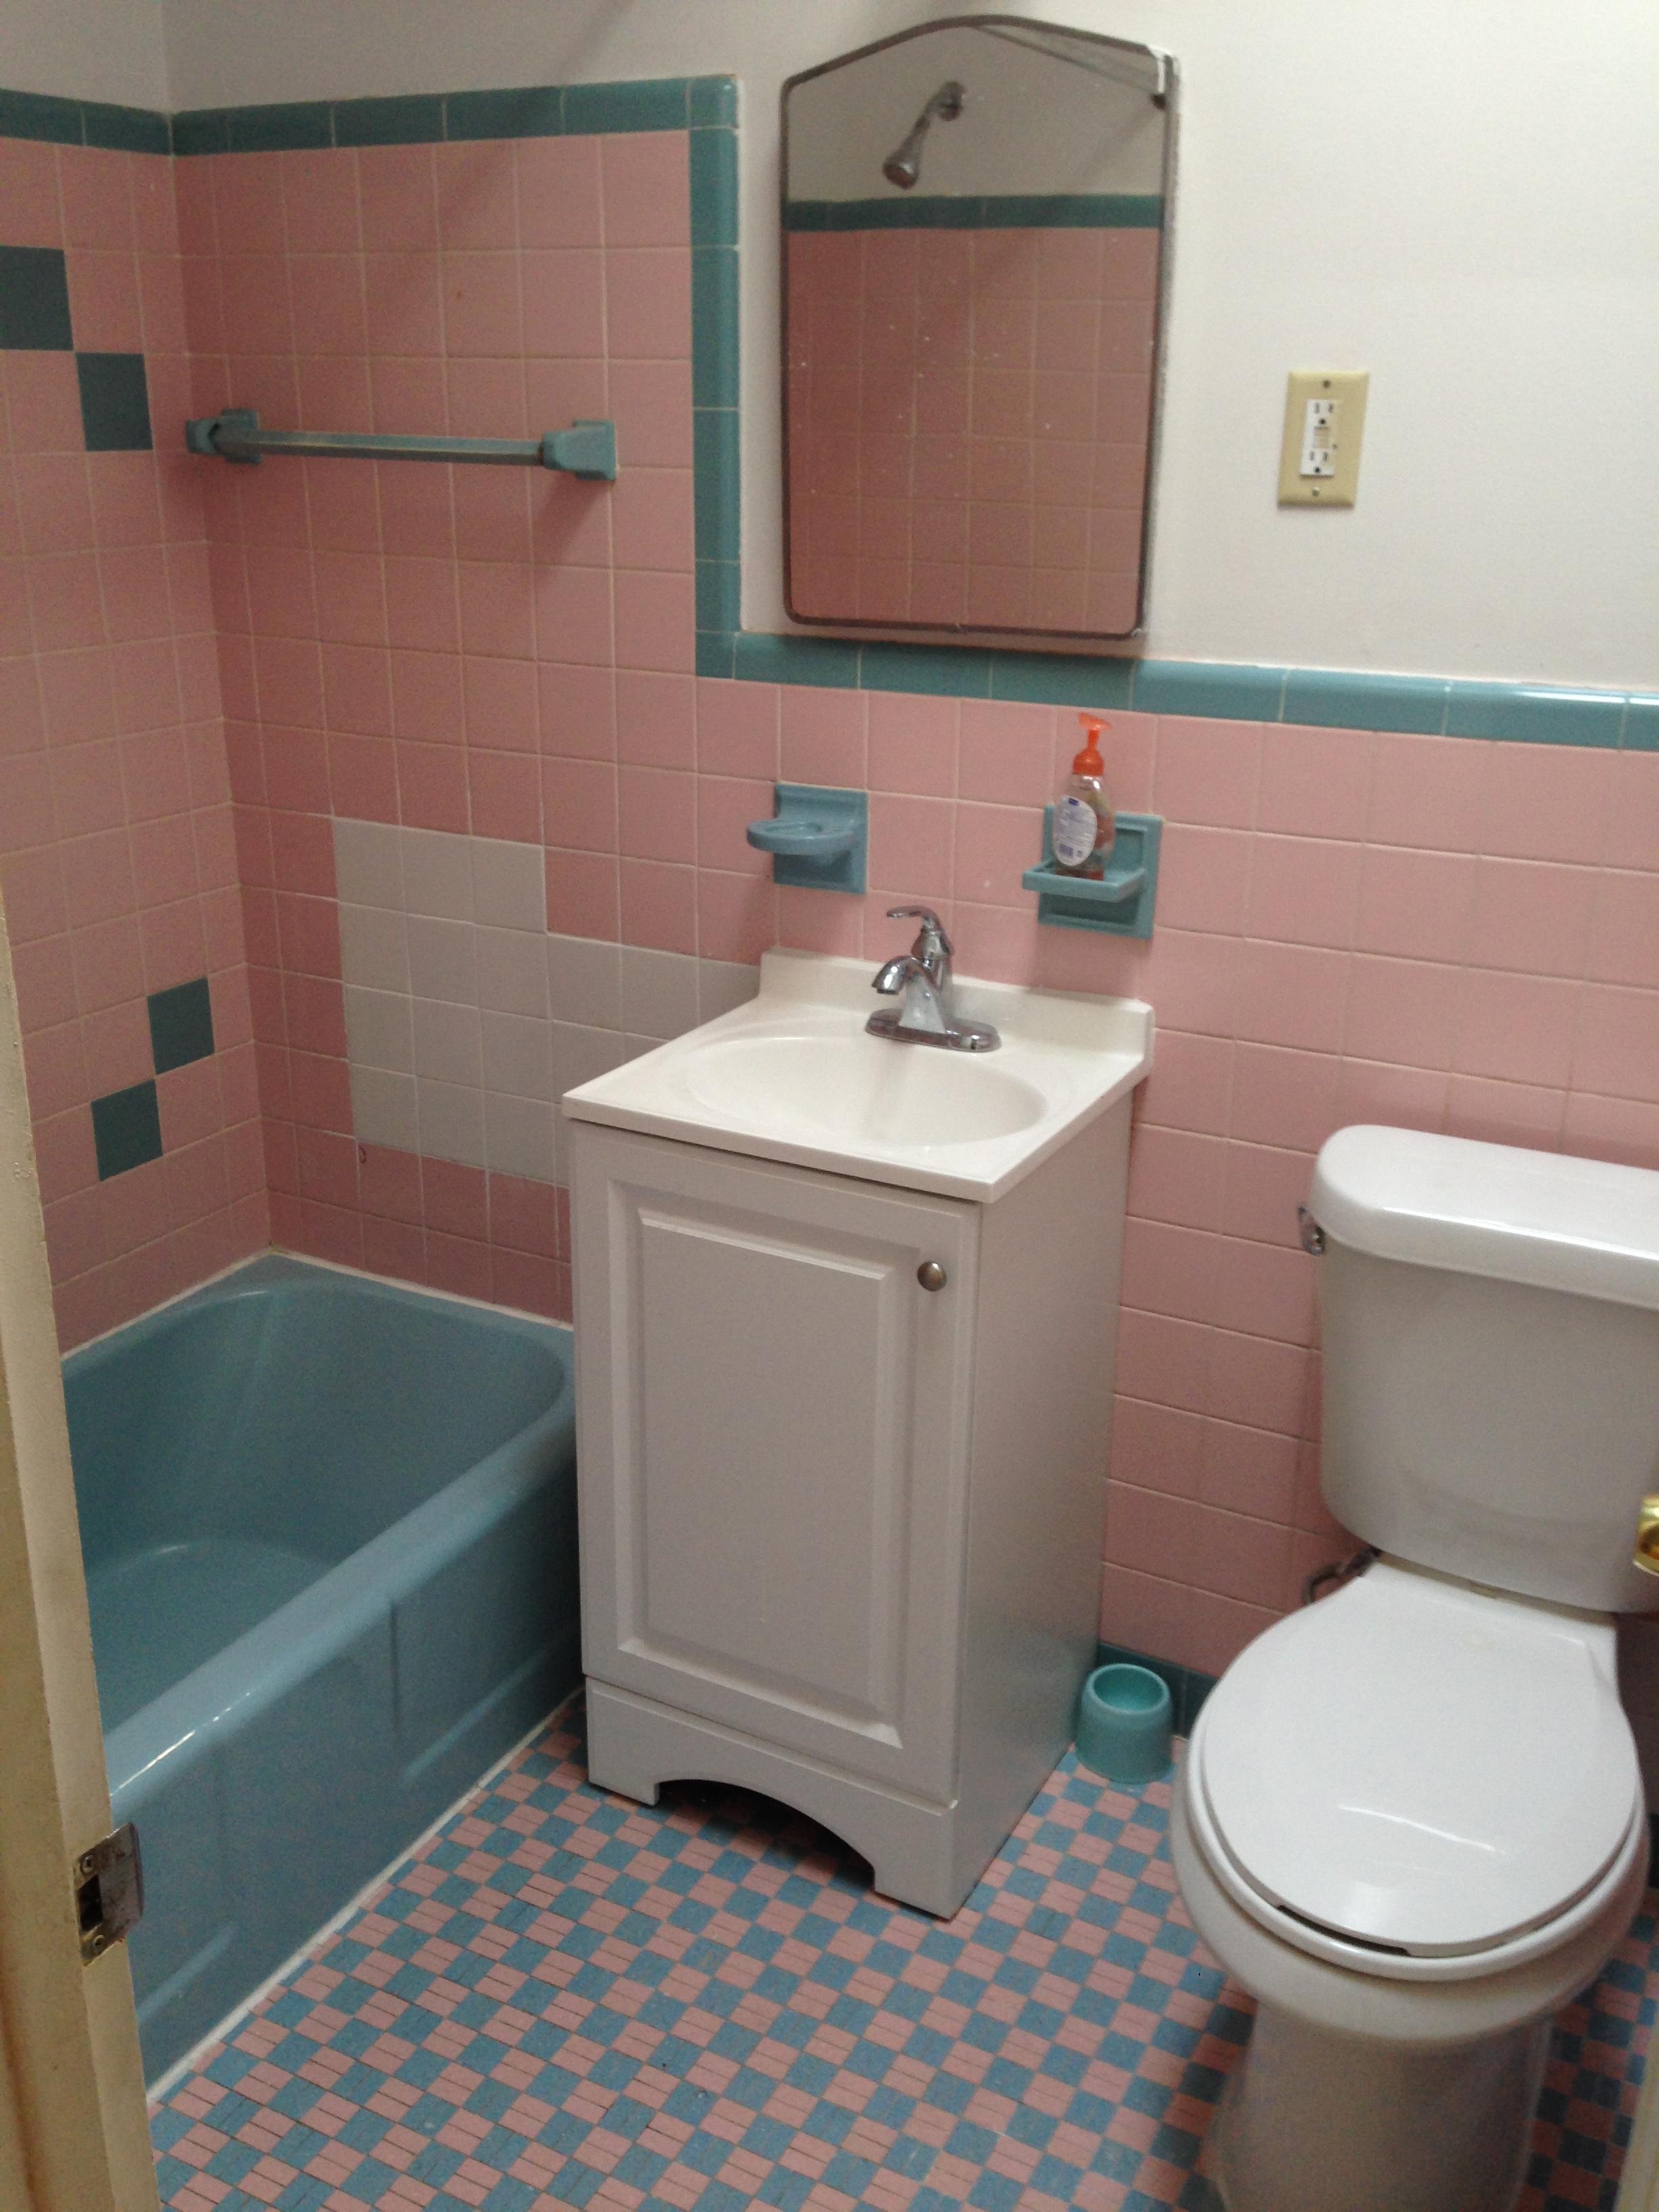 268 Bridge bathroom